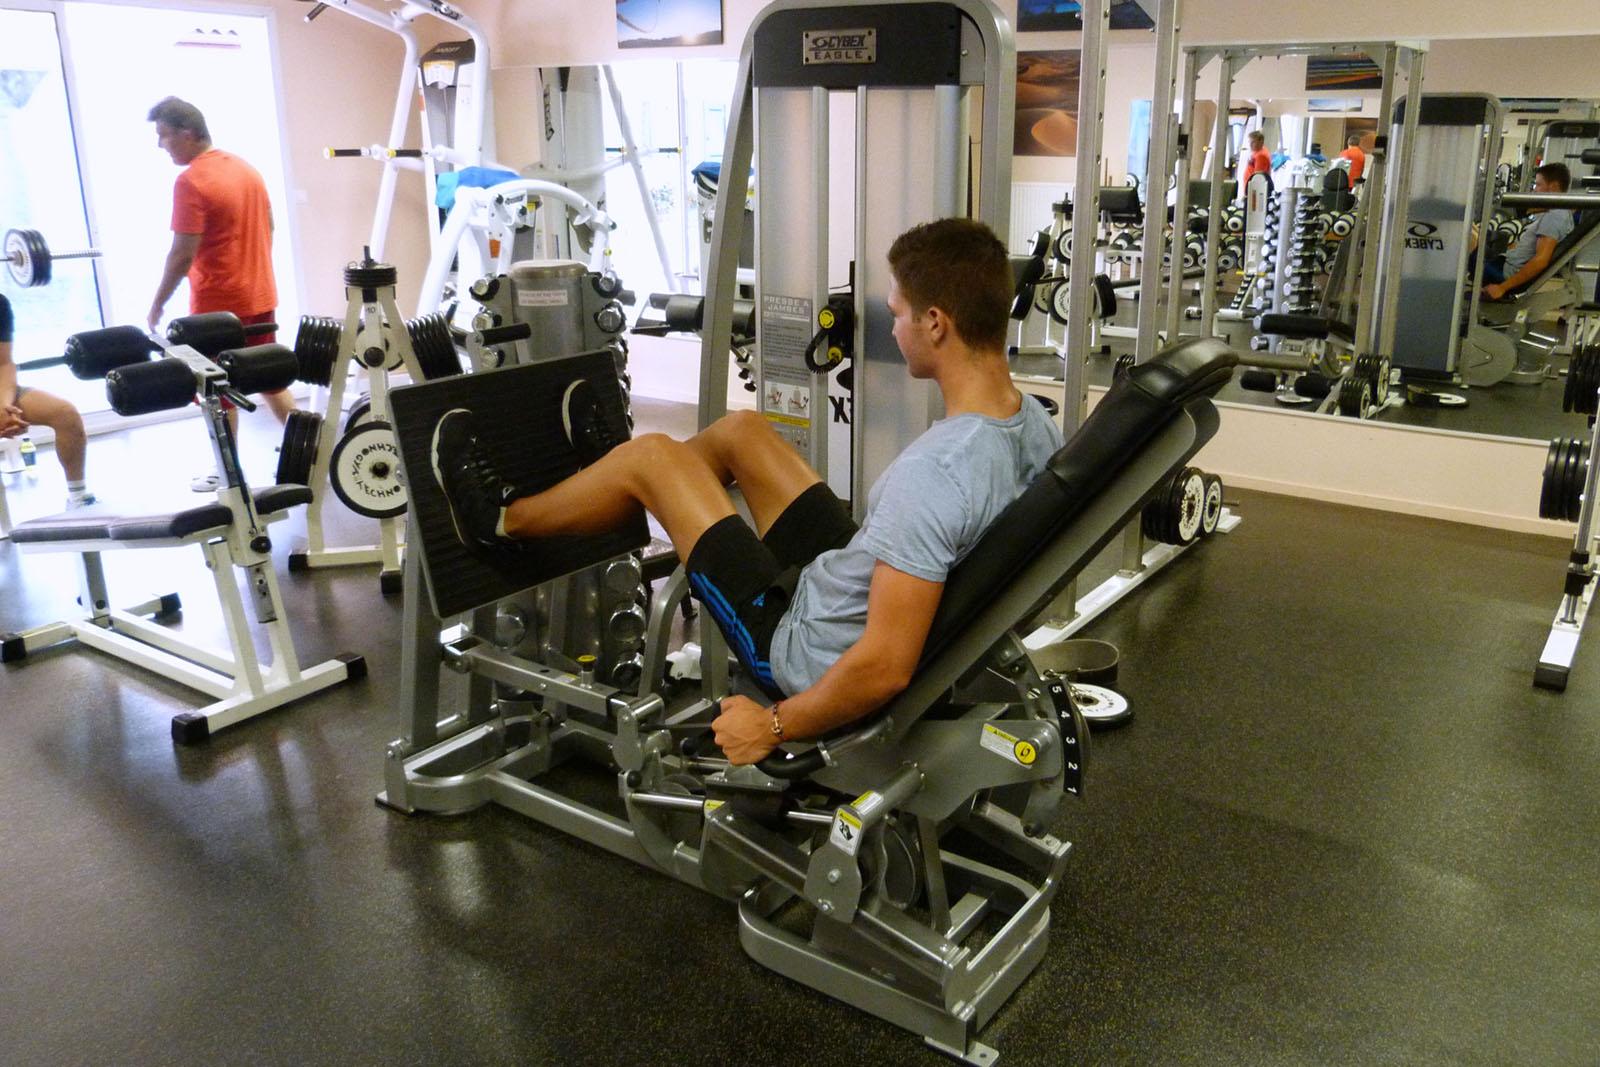 salle de sport bergerac leg press eagle cybex3